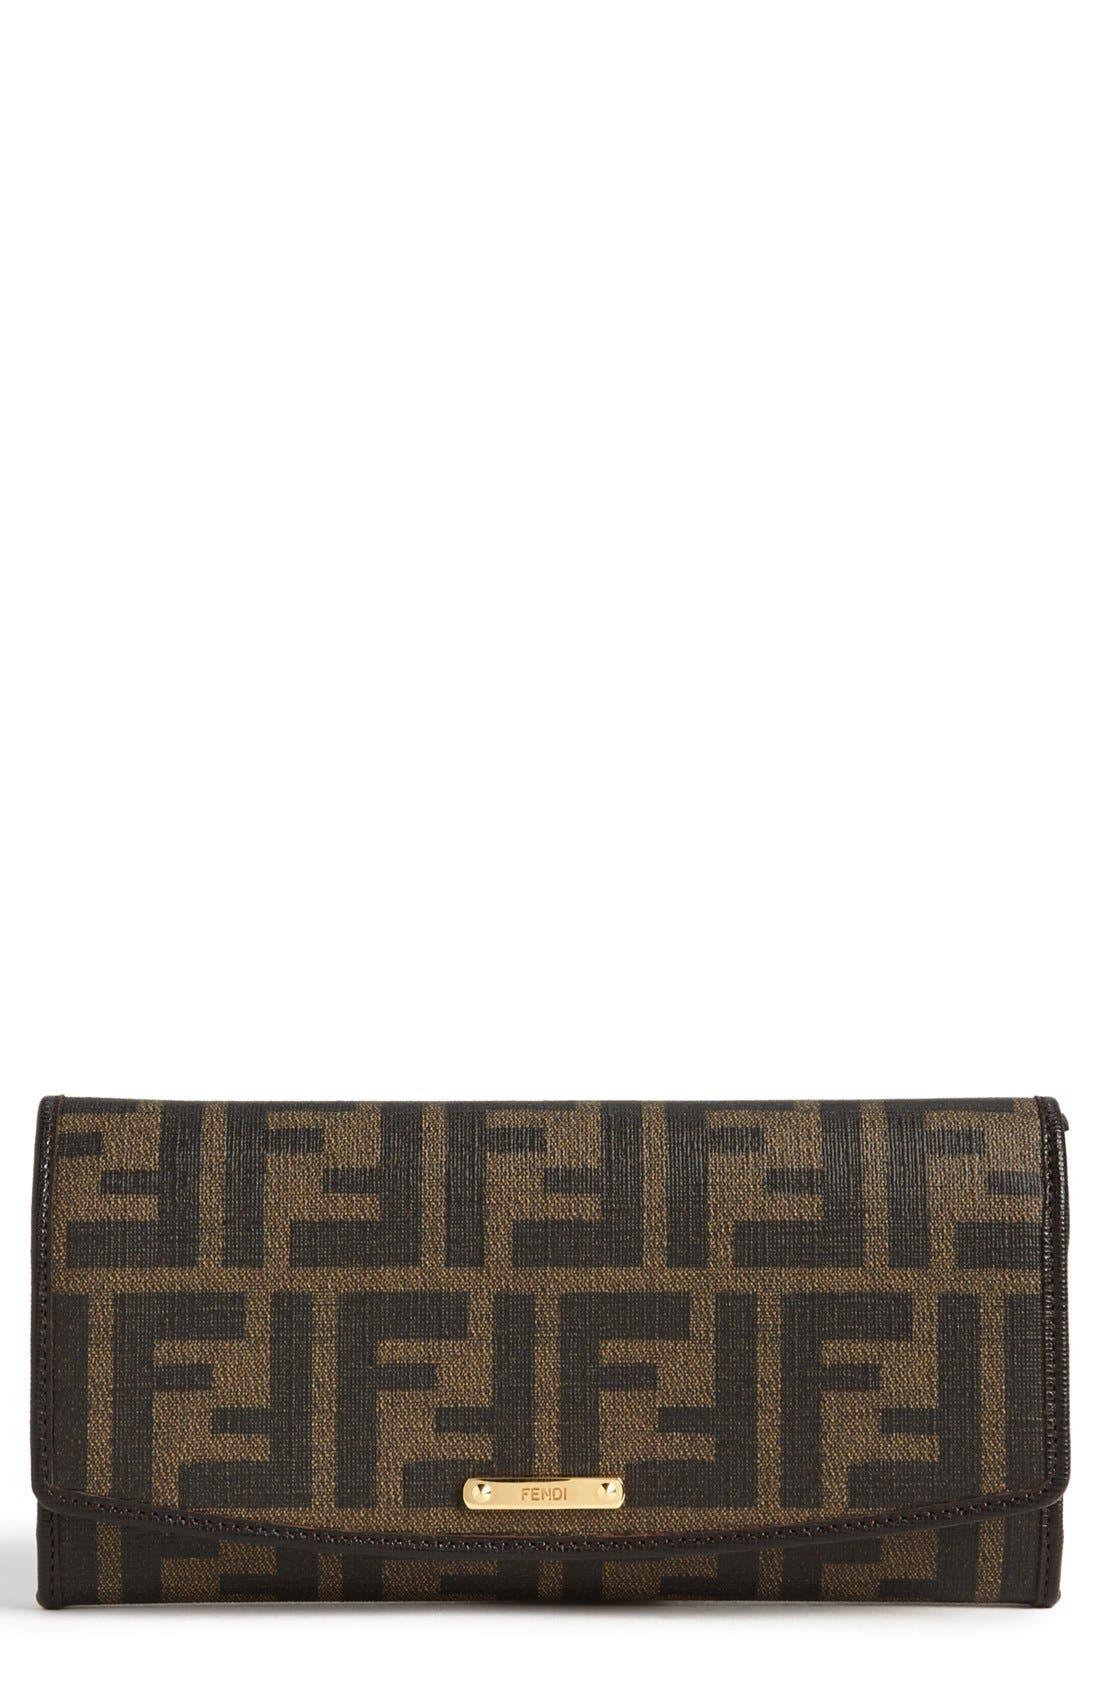 Main Image - Fendi 'Zucca' Continental Wallet